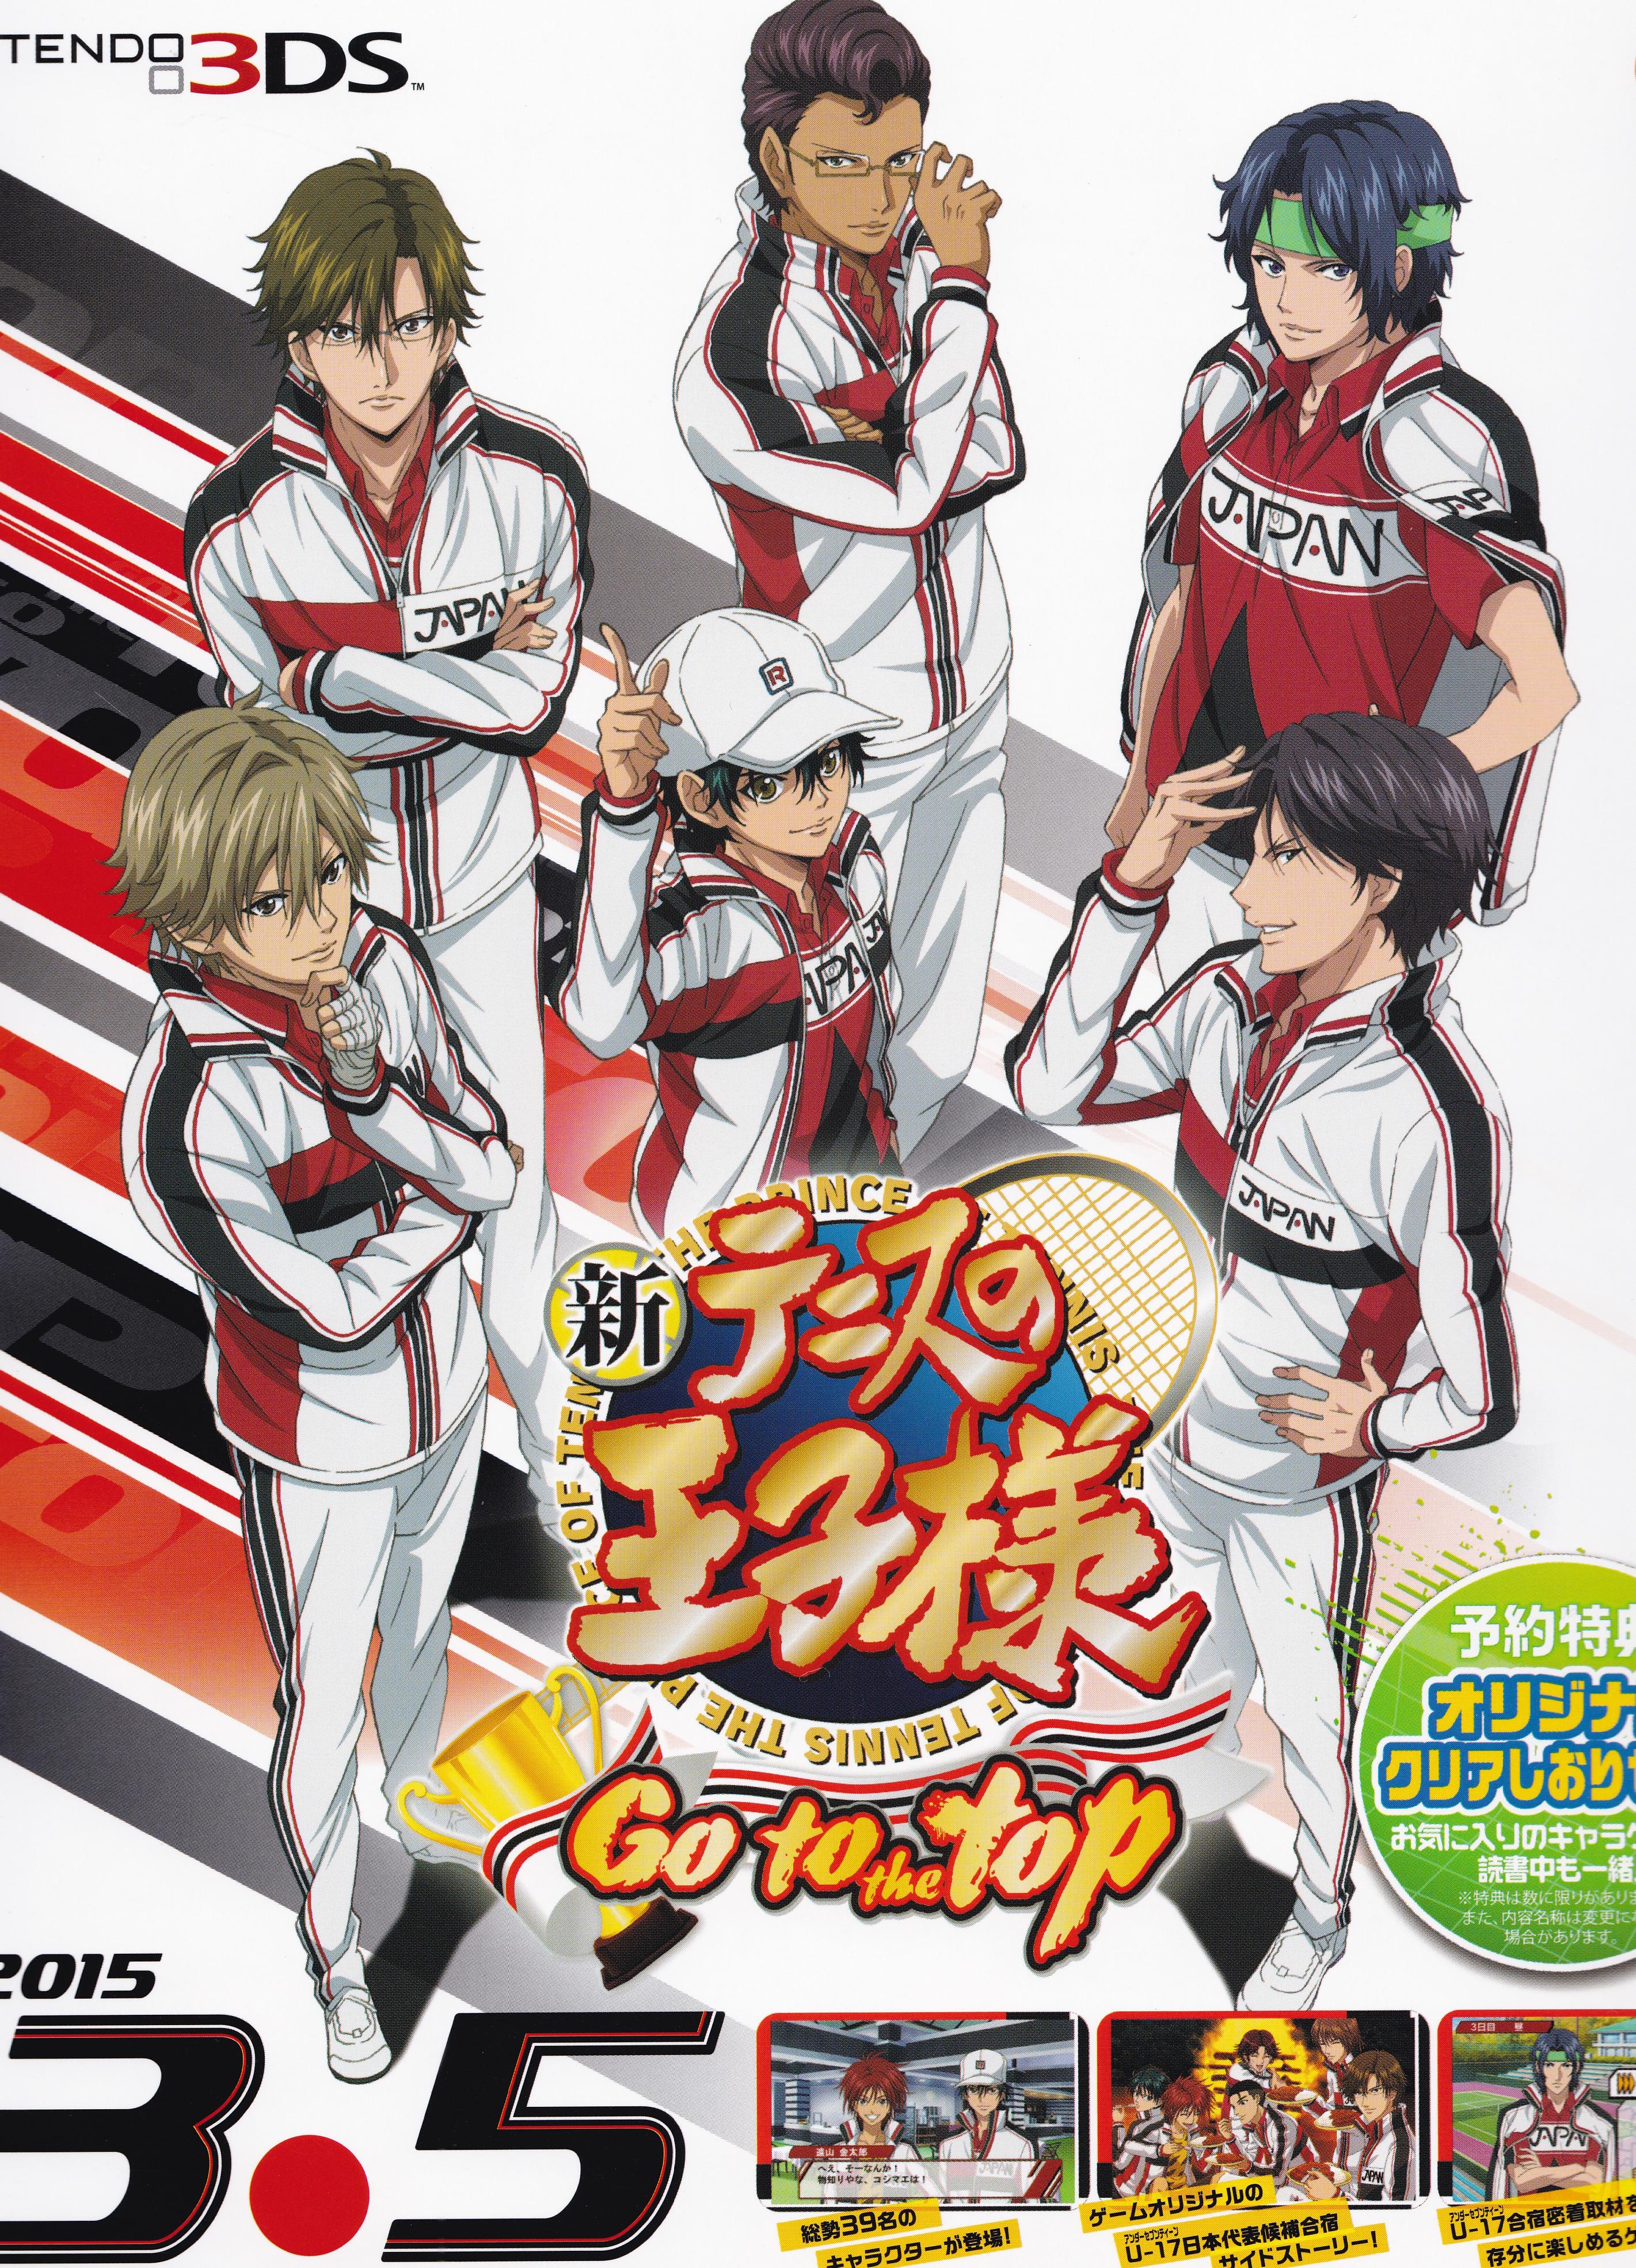 Tags Anime, Konomi Takeshi, New Prince of Tennis, Tennis